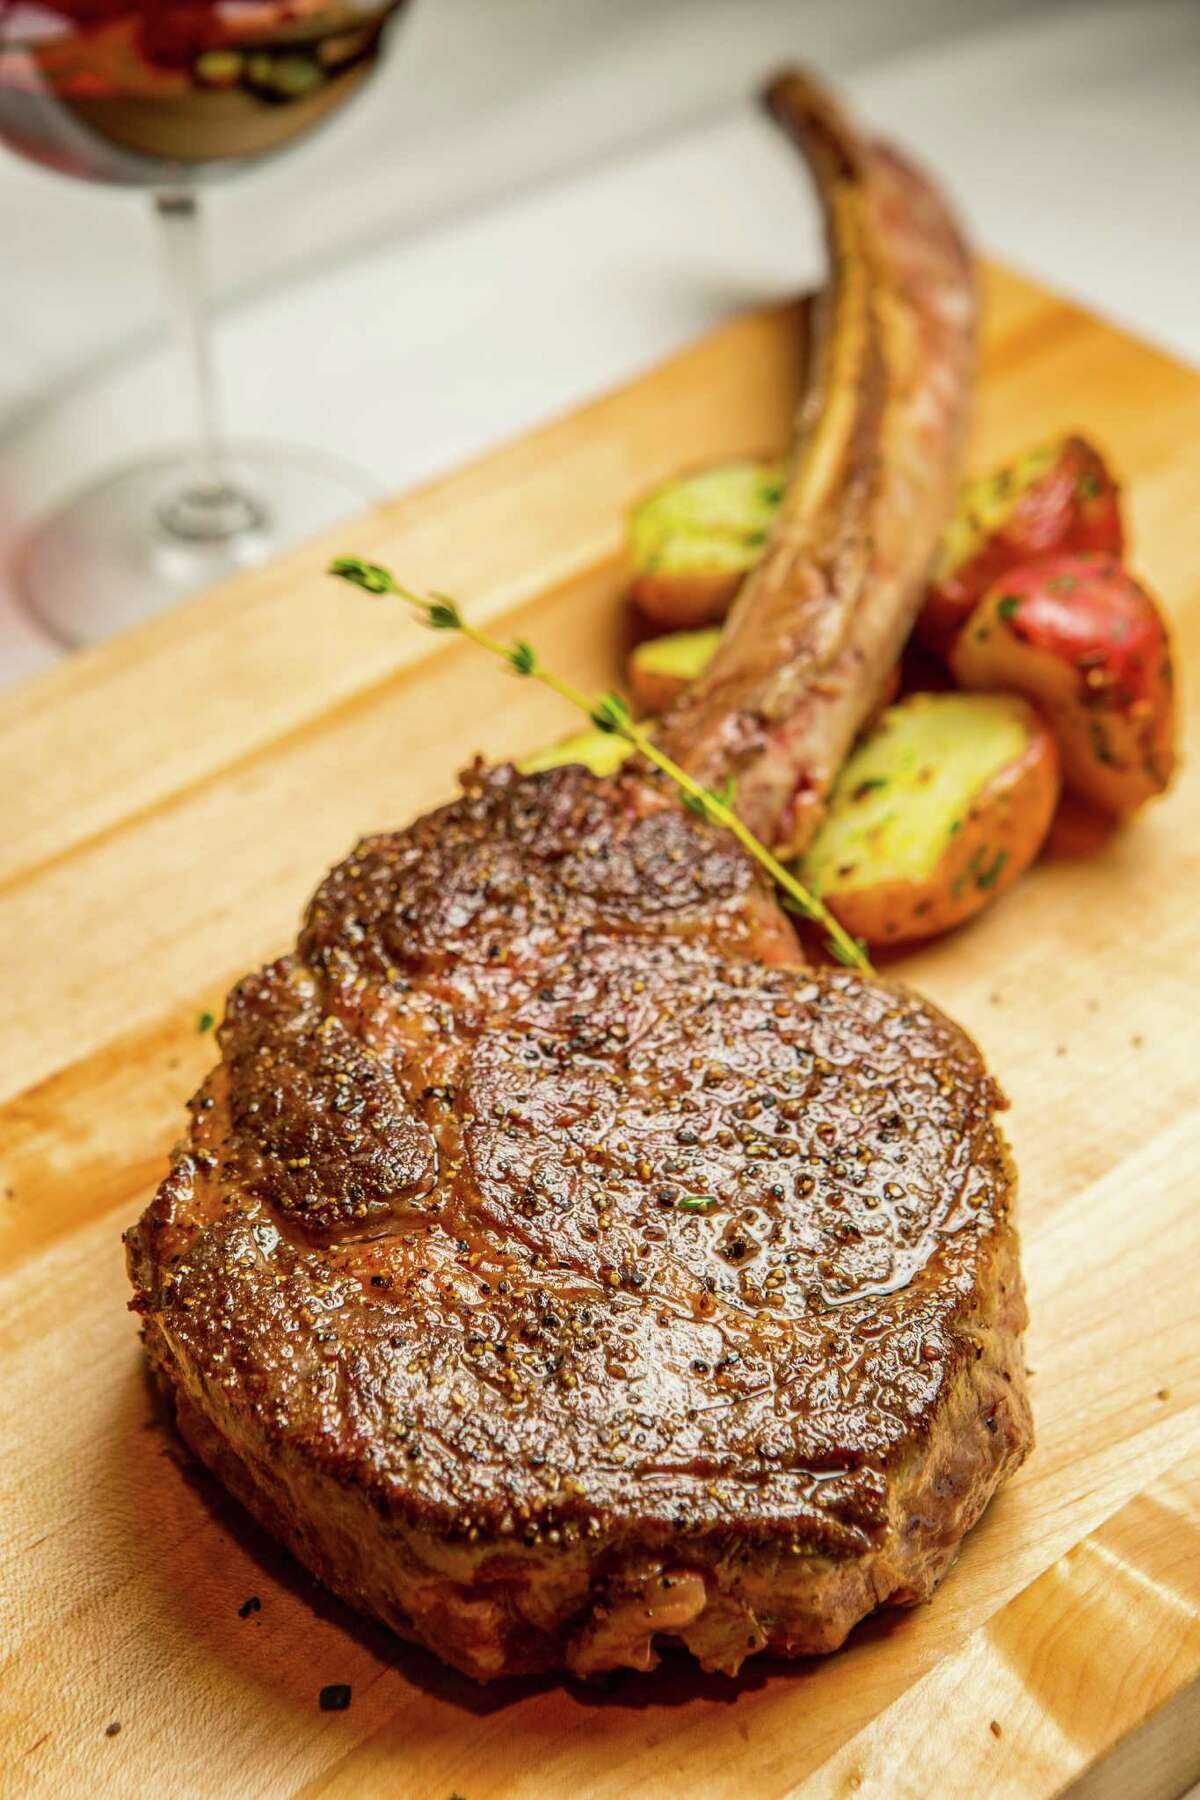 Killen's Steakhouse's American wagyu long bone ribeye